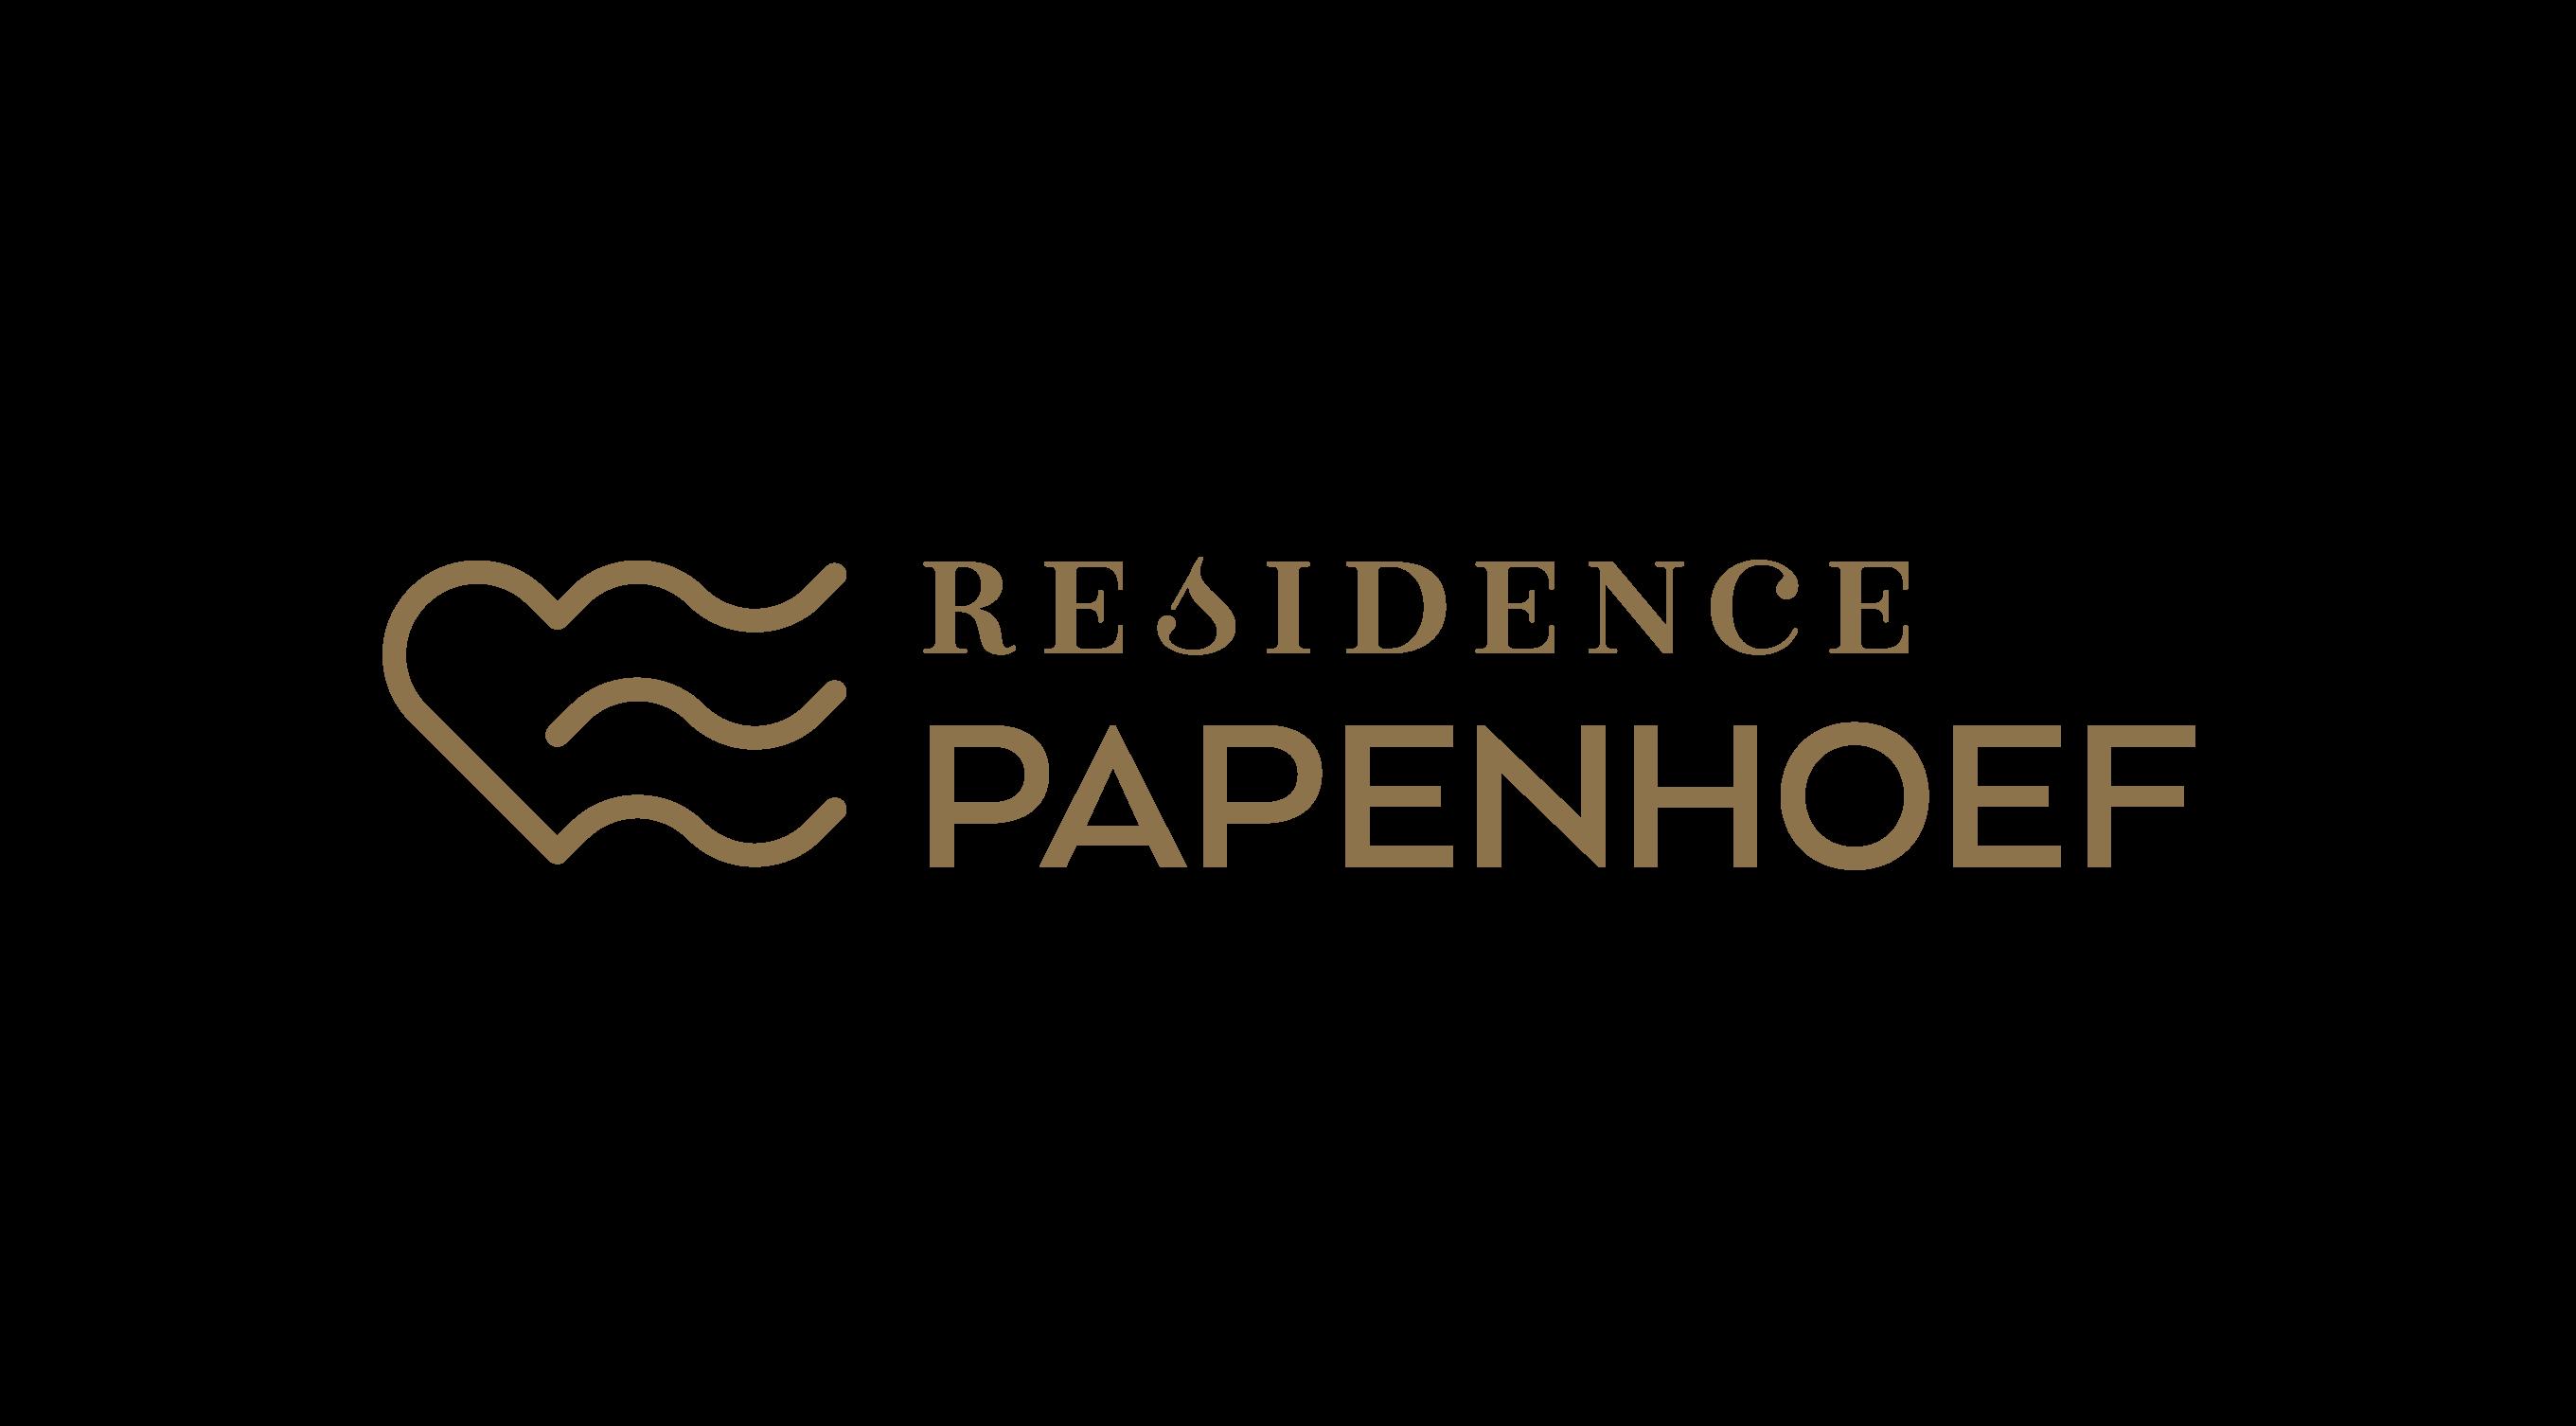 Logo laten ontwerpen, ux designer, website laten maken Rotterdam, grafisch ontwerper